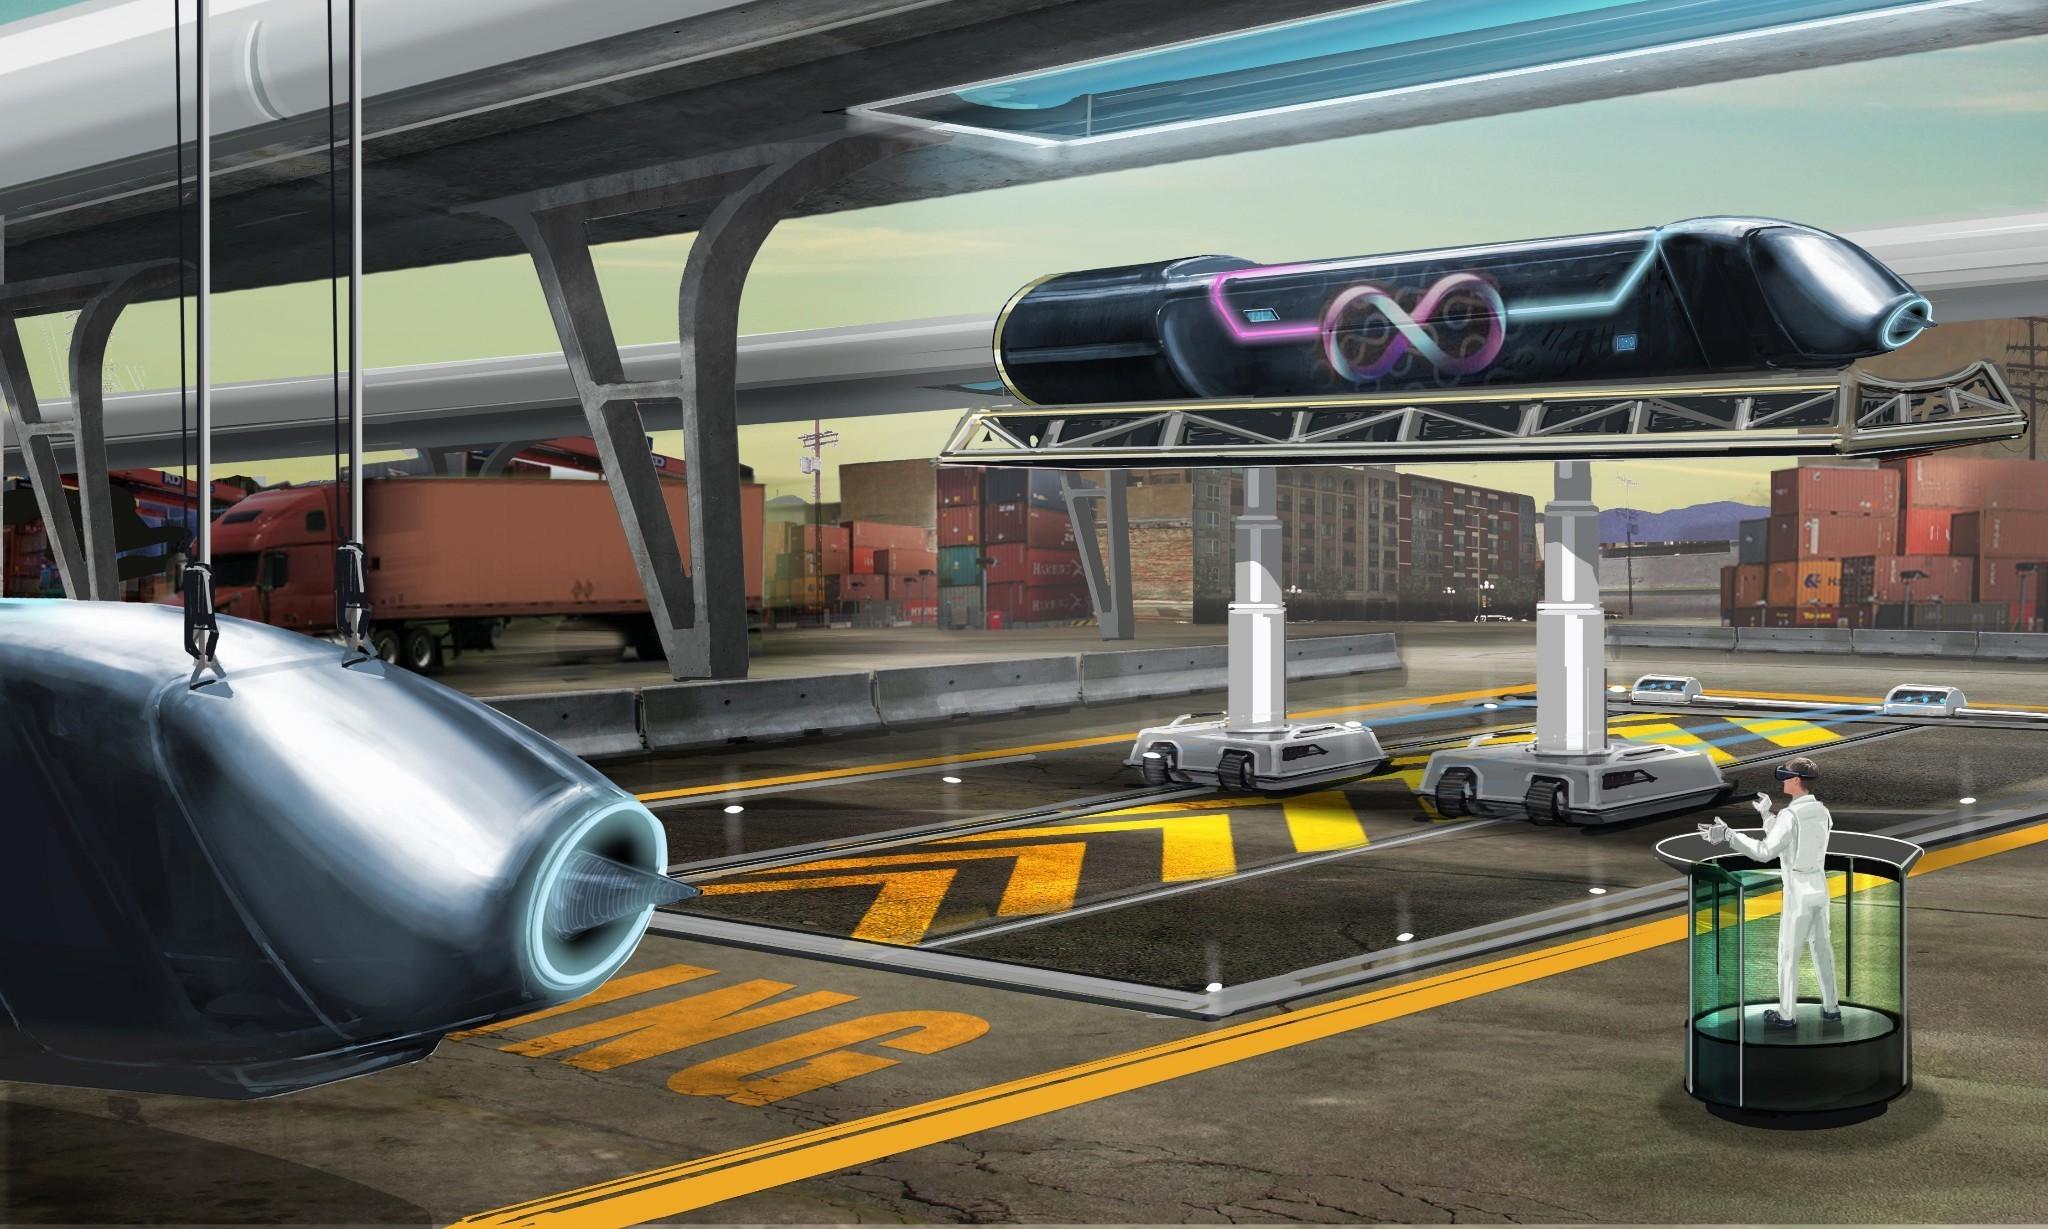 Elon Musk's Hyperloop could head to 'old' Europe before California